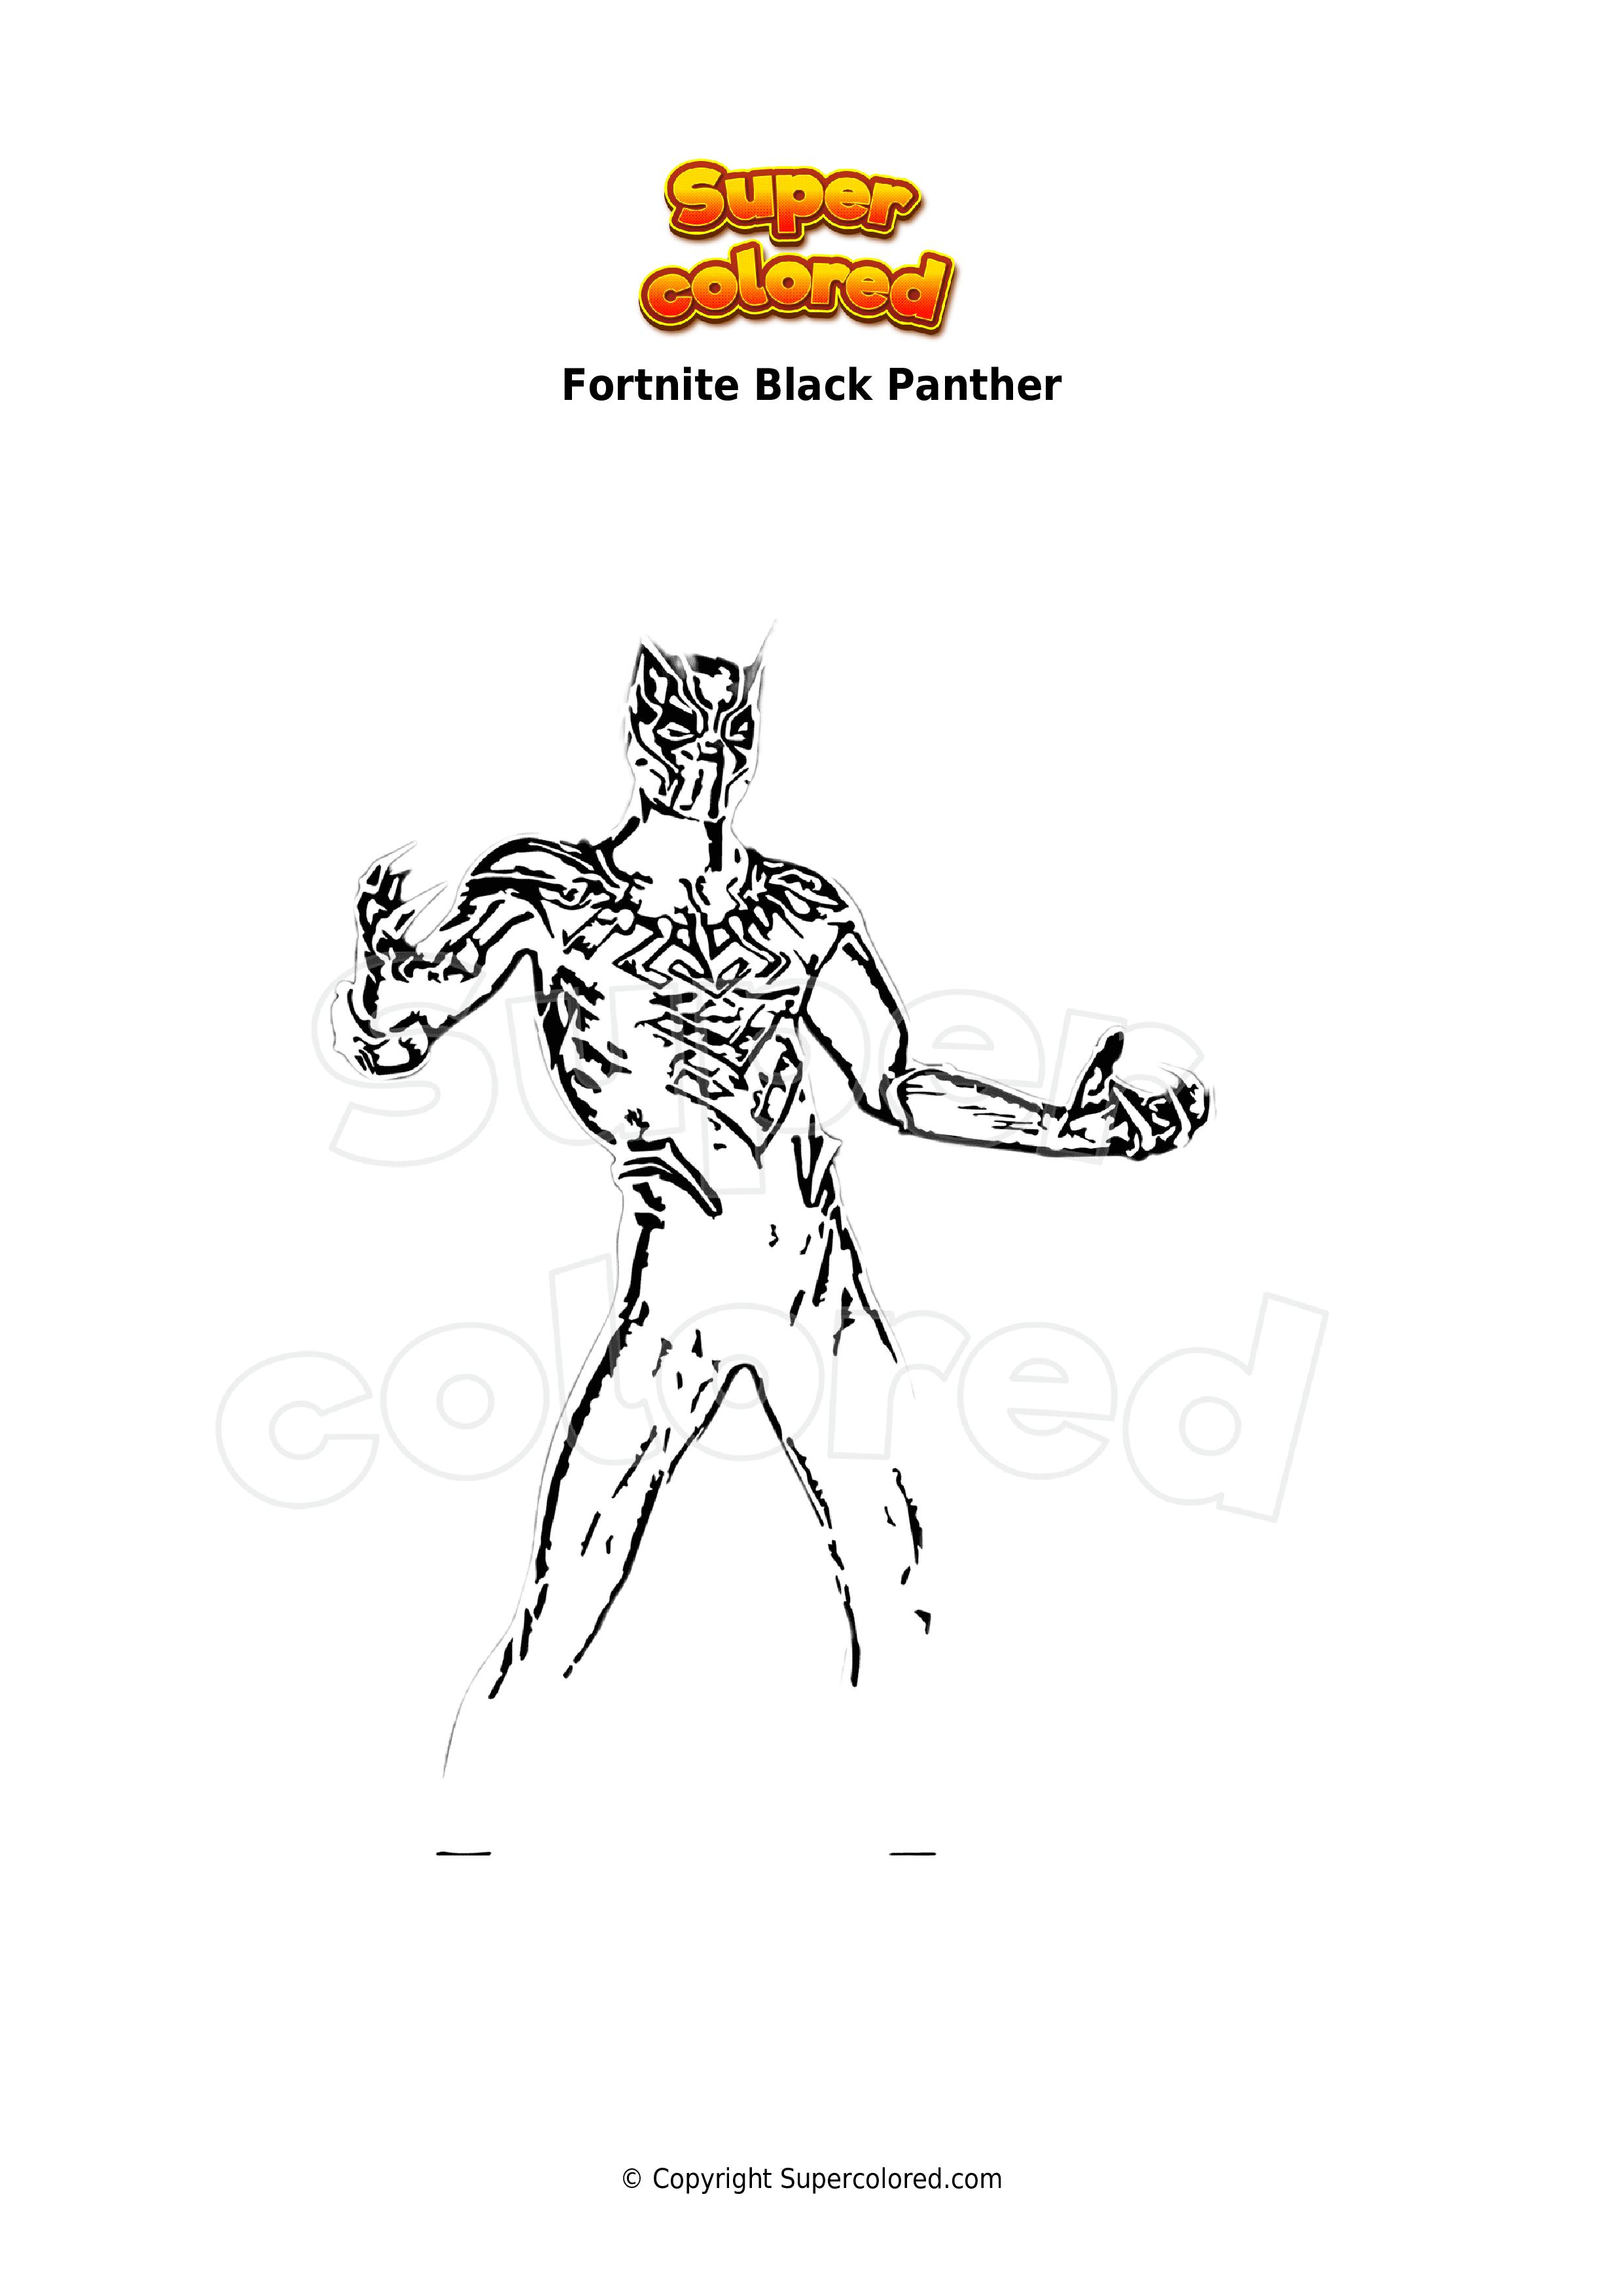 Ausmalbild Fortnite Black Panther - Supercolored.com